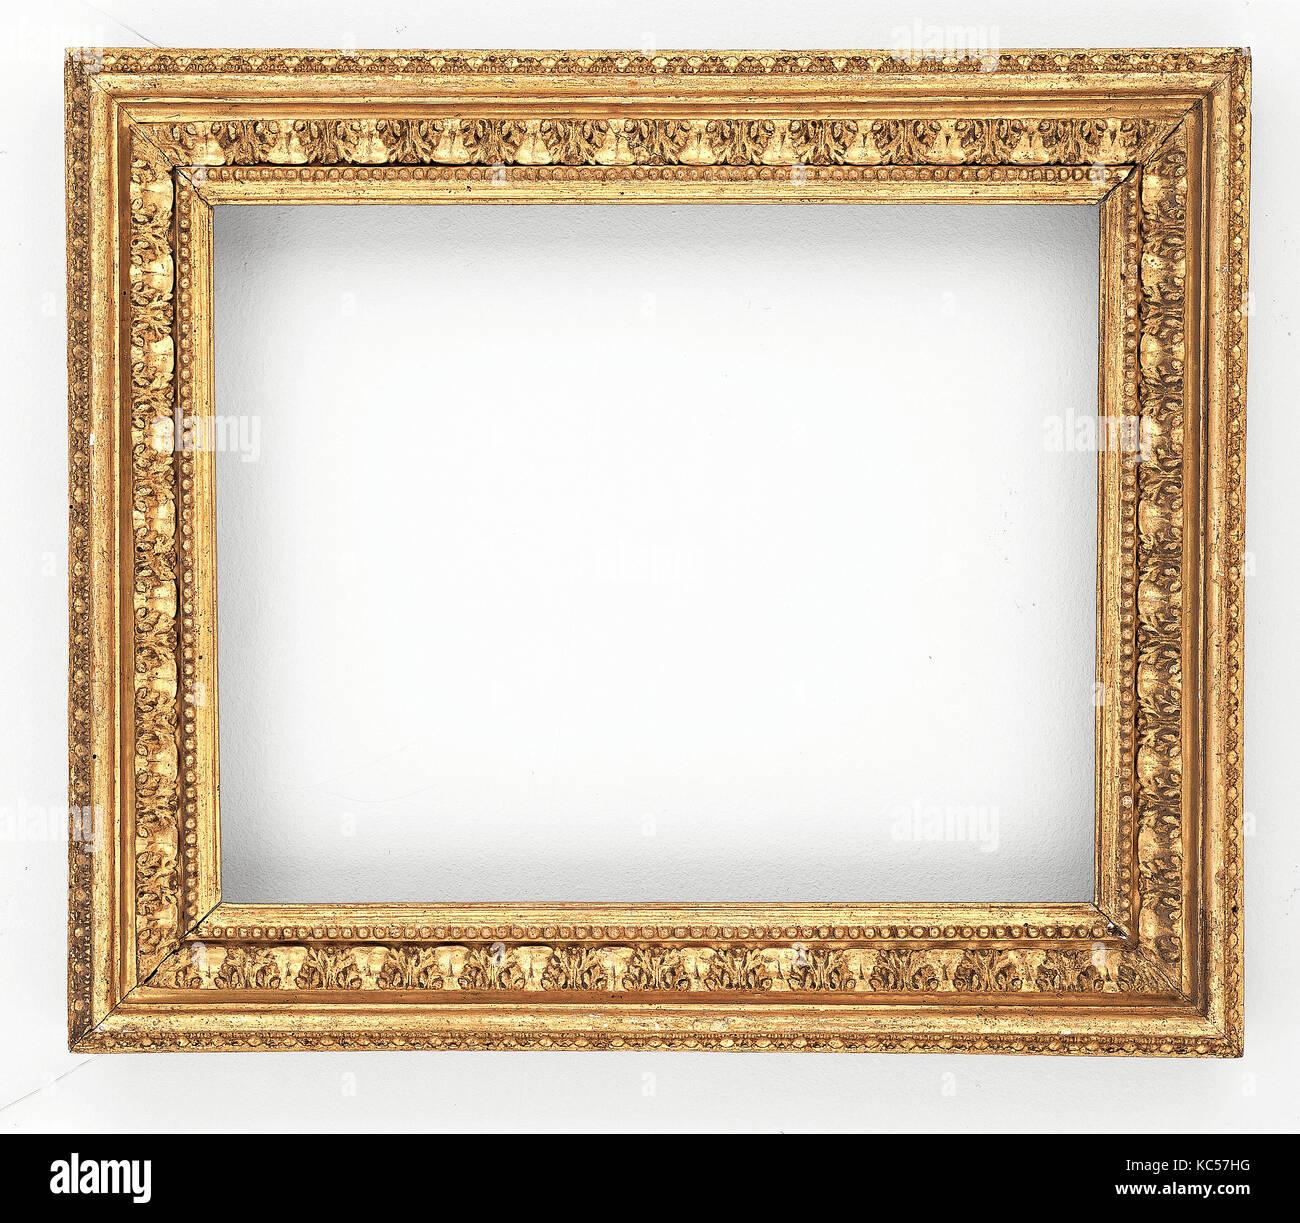 Frame, Ca. 1680-1700, Pappel, Gesamt: 19 1/2 x 22 7/8 in. (49,5 x 58,1 cm); Augen: 131/2 x 17 in. (34,3 x 43,2 cm); Stockbild